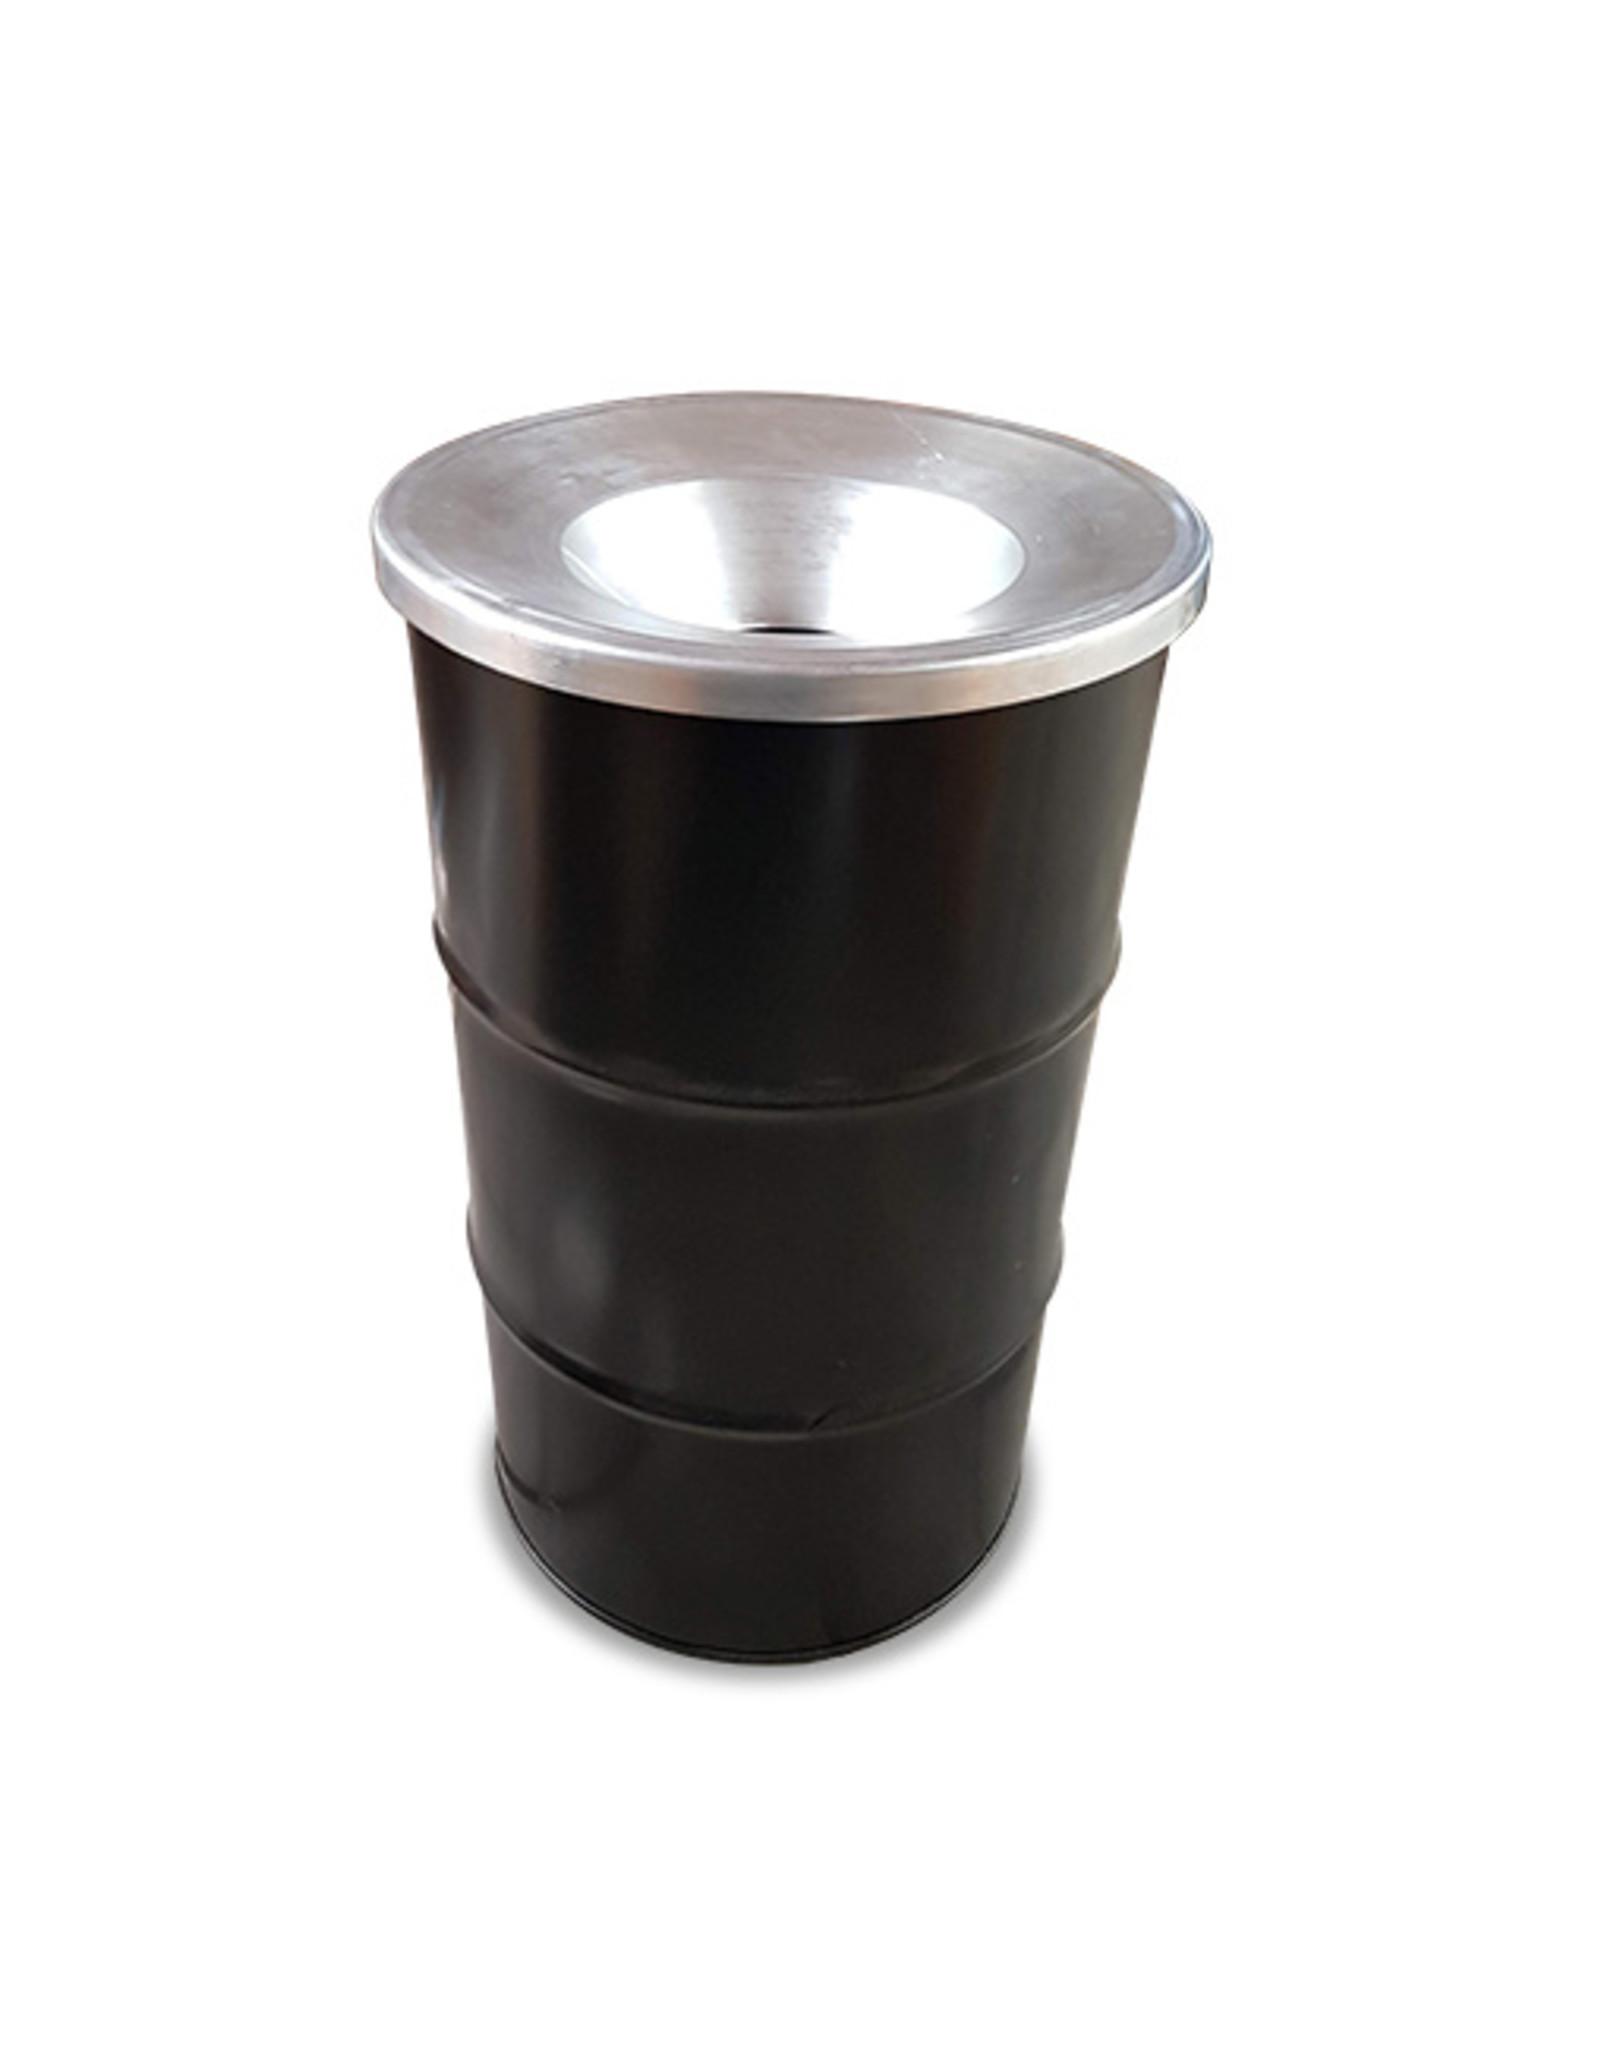 The Binbin BinBin vlamwerend deksel met gat voor 120 Liter olievat